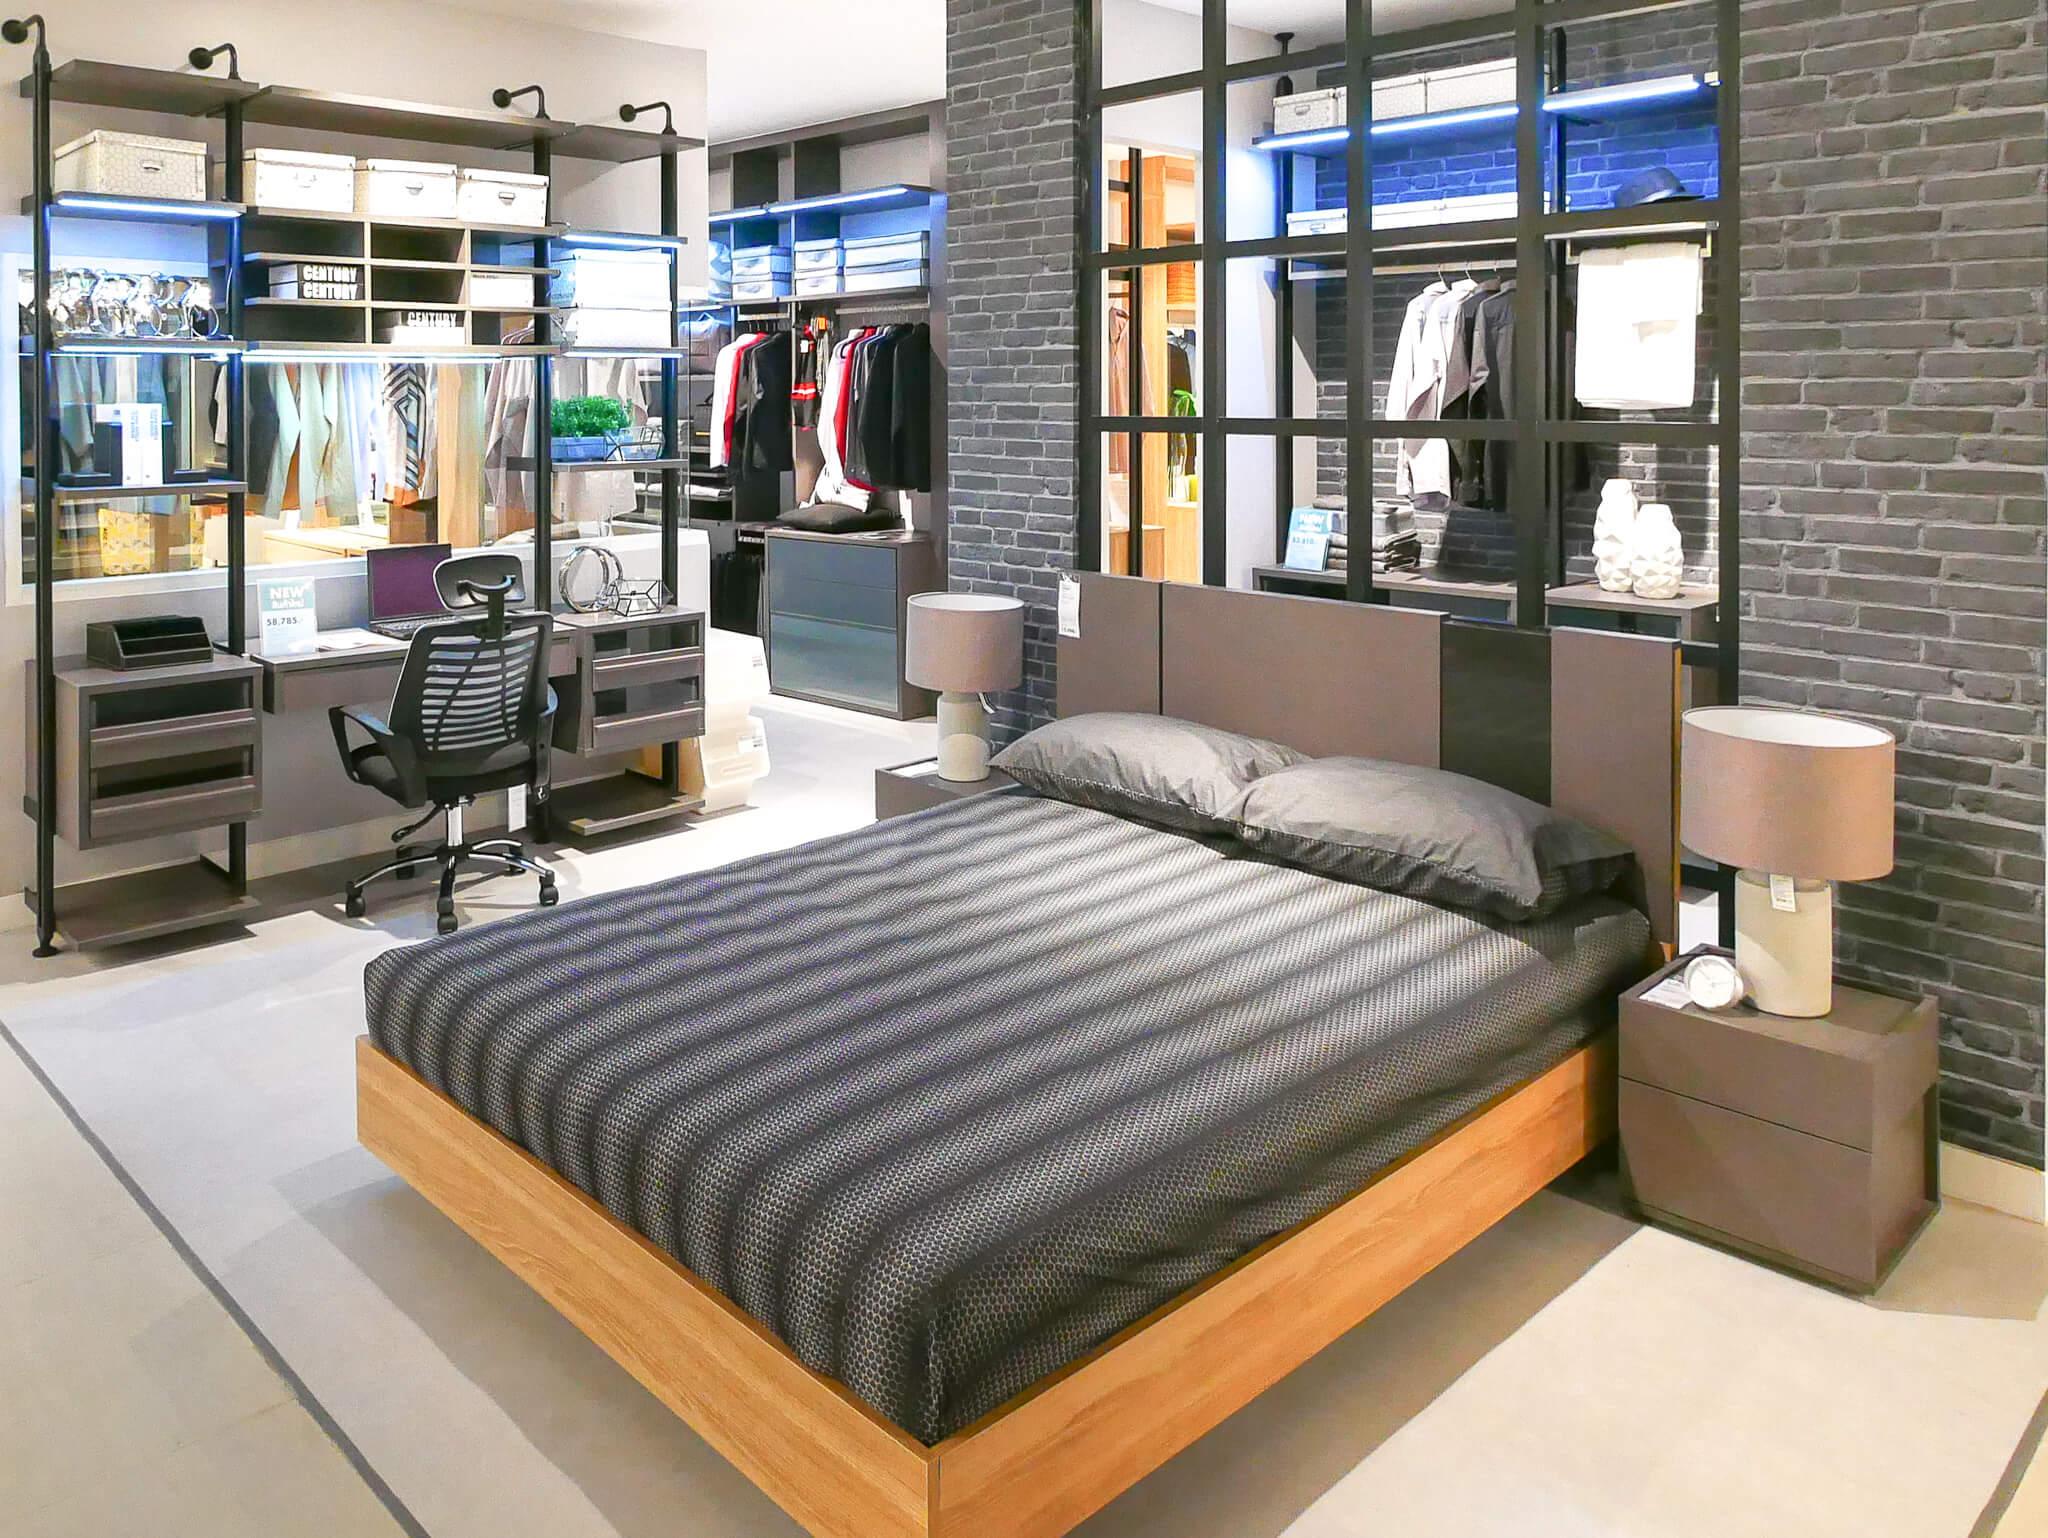 "Index Living Mall พระราม 2 เปิดใหม่ไม่ใช่แค่ ""ร้านเฟอร์นิเจอร์"" แต่เป็น ""Lifestyle Destination"" แนว URBAN STYLISH 67 - Index Living Mall (อินเด็กซ์ ลิฟวิ่งมอลล์)"